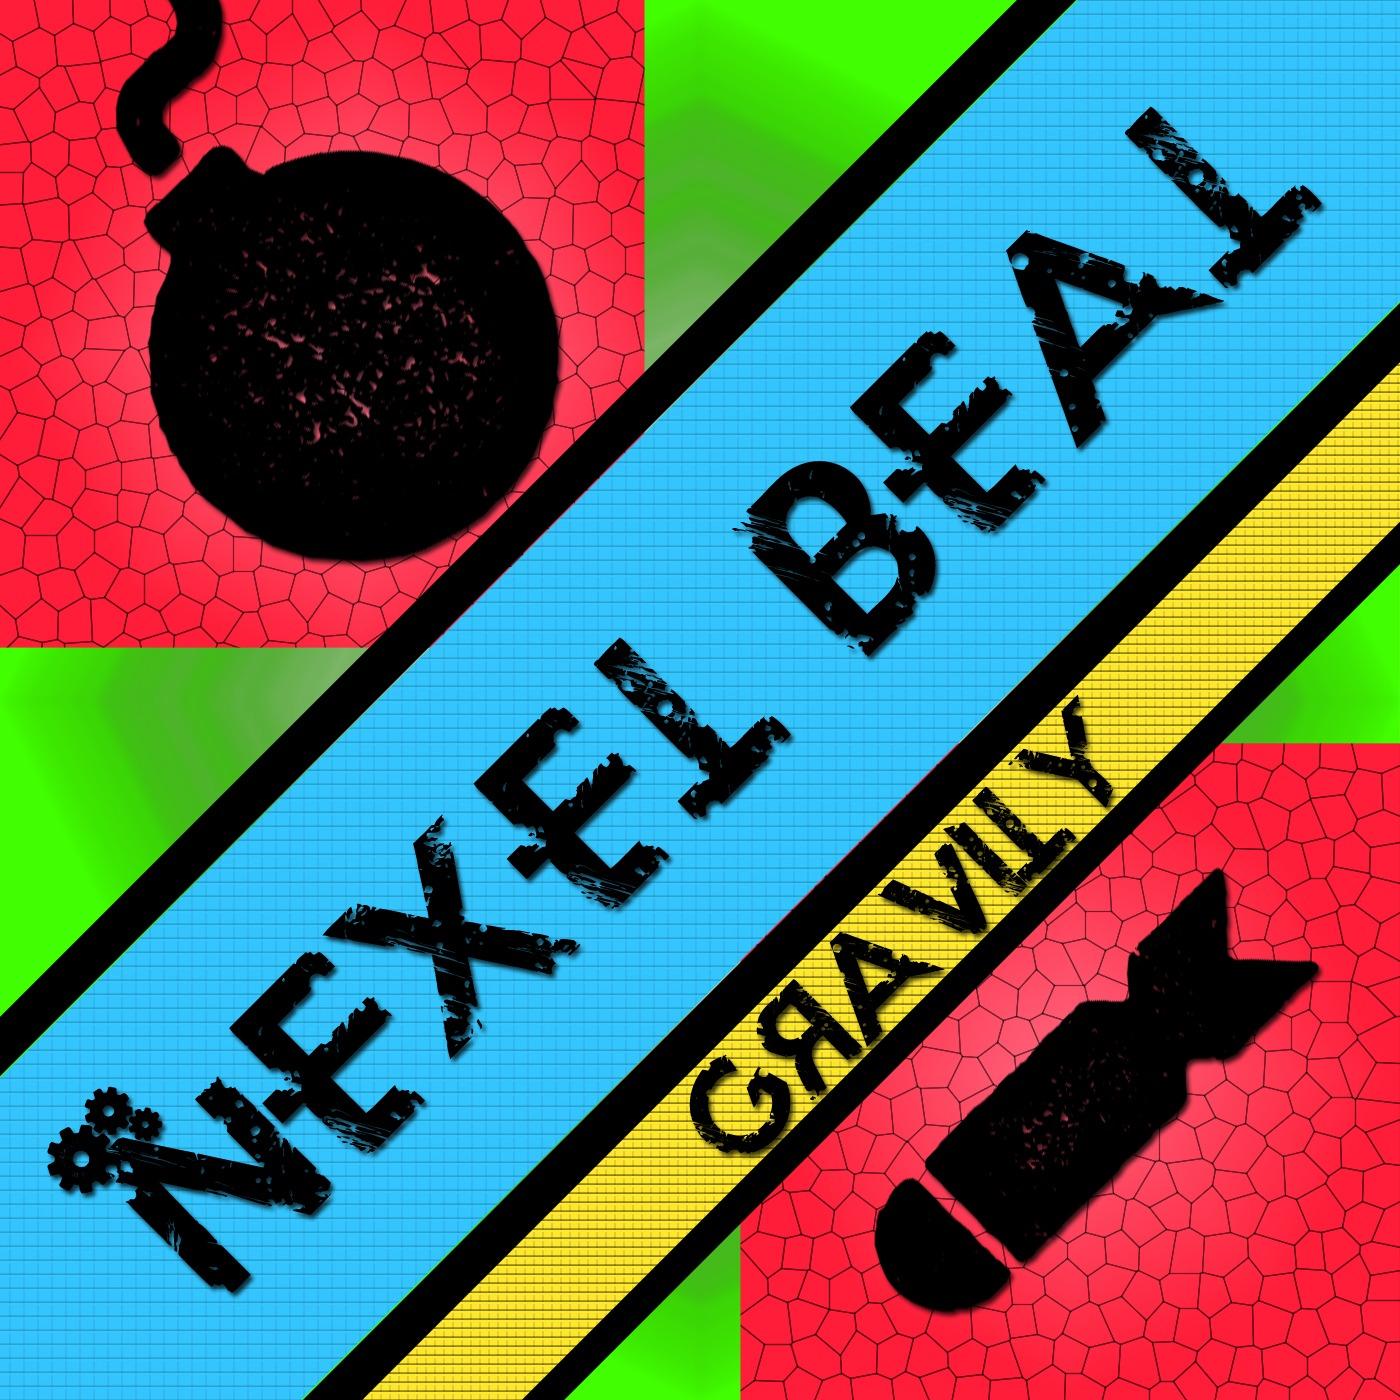 Next Beat presents GRAVITY